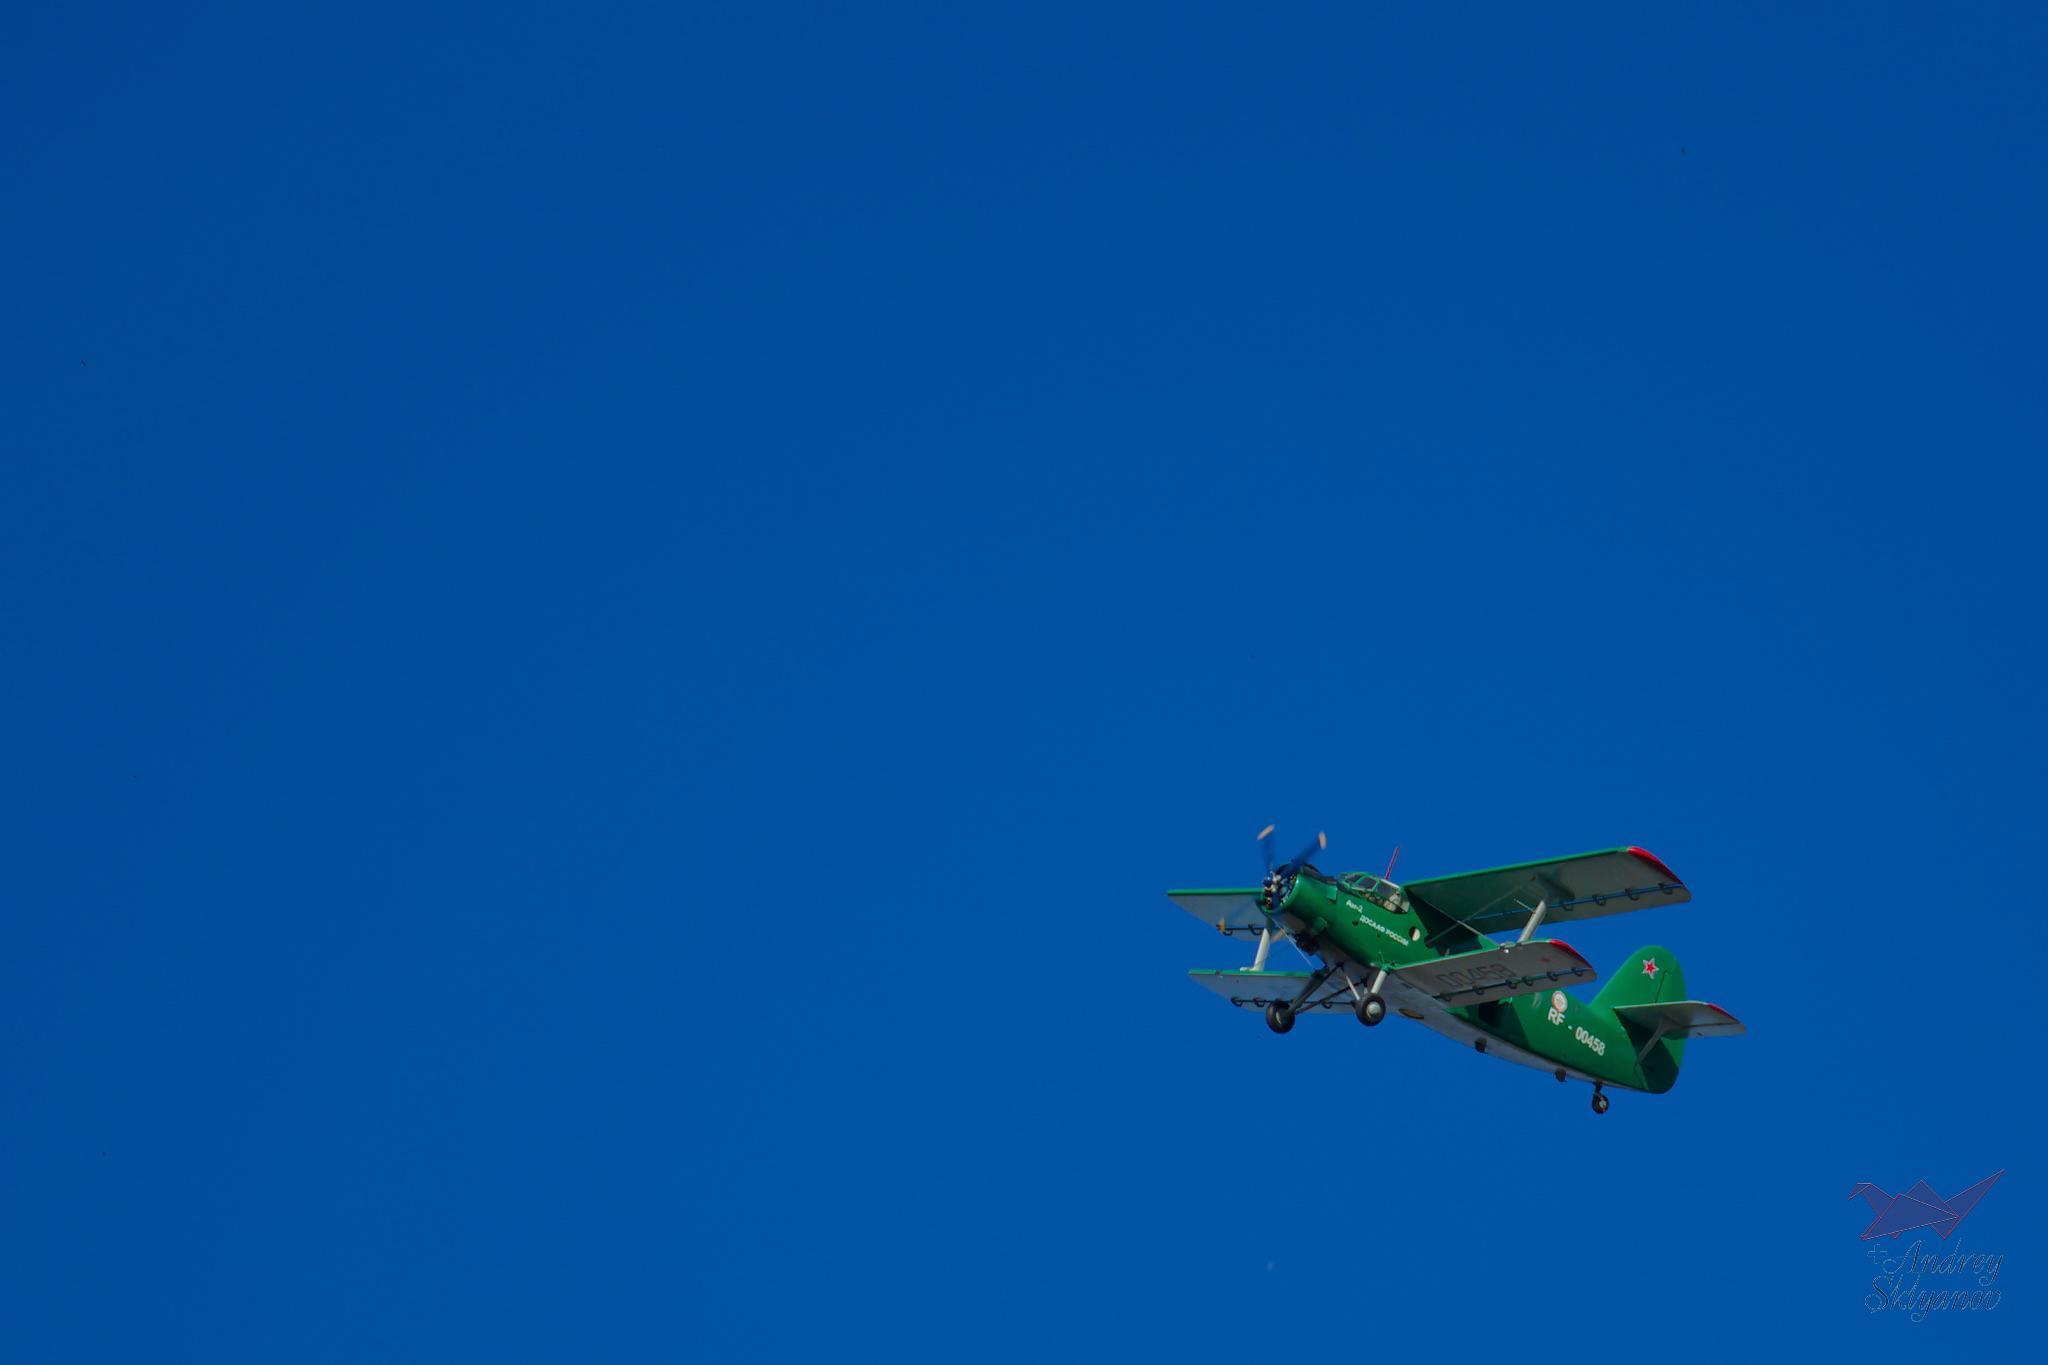 Airplane on the blue sky by Andrey Sklyanov